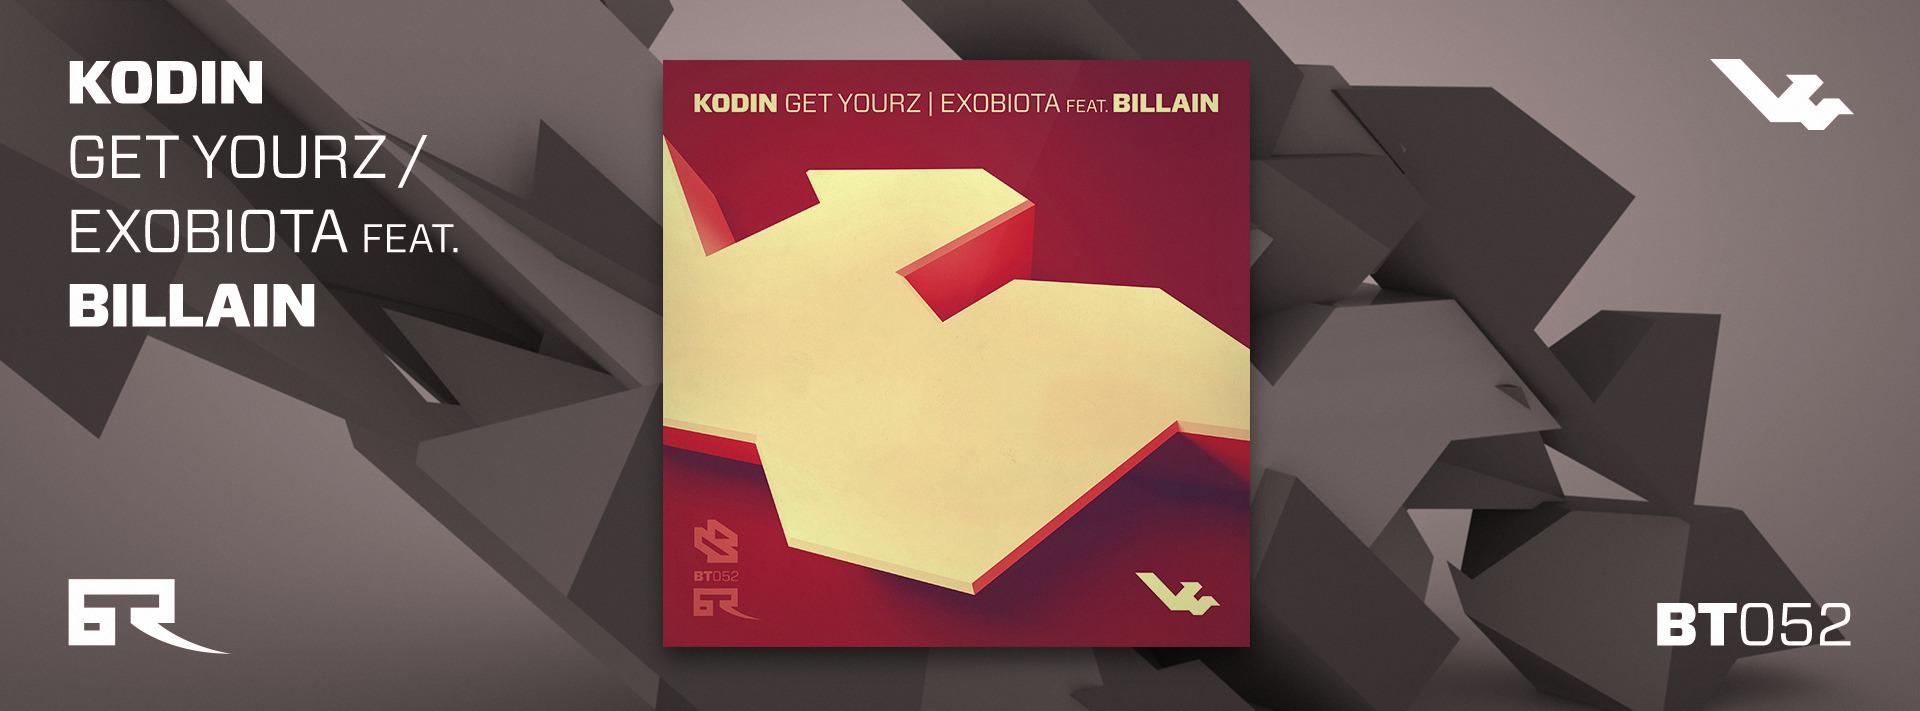 Kodin (@kodin) Cover Image